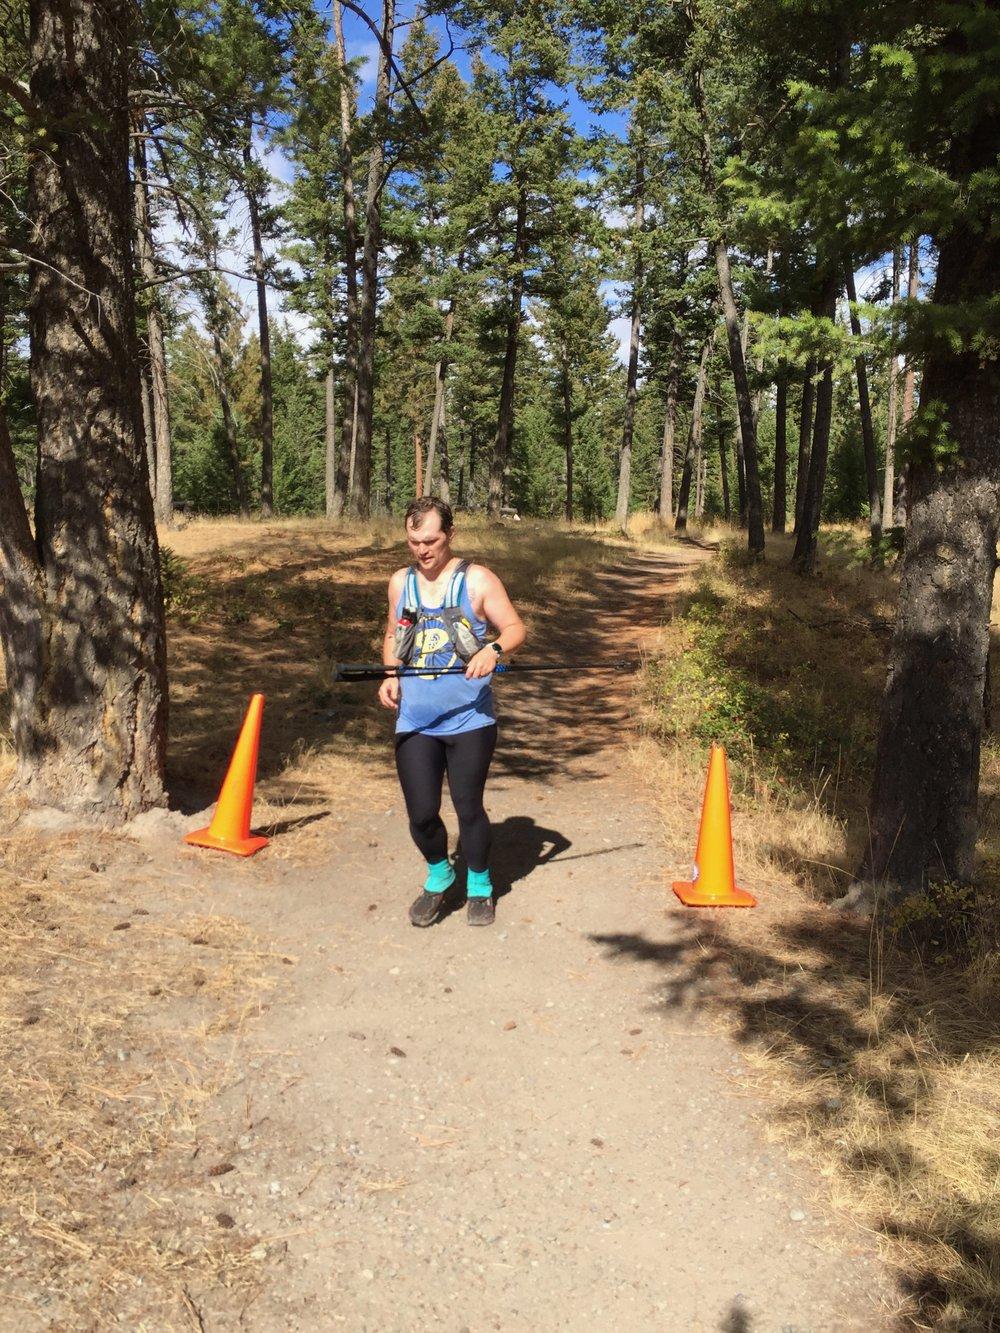 foys to blacktail trails trail marathon ftbtIMG_1096.JPG